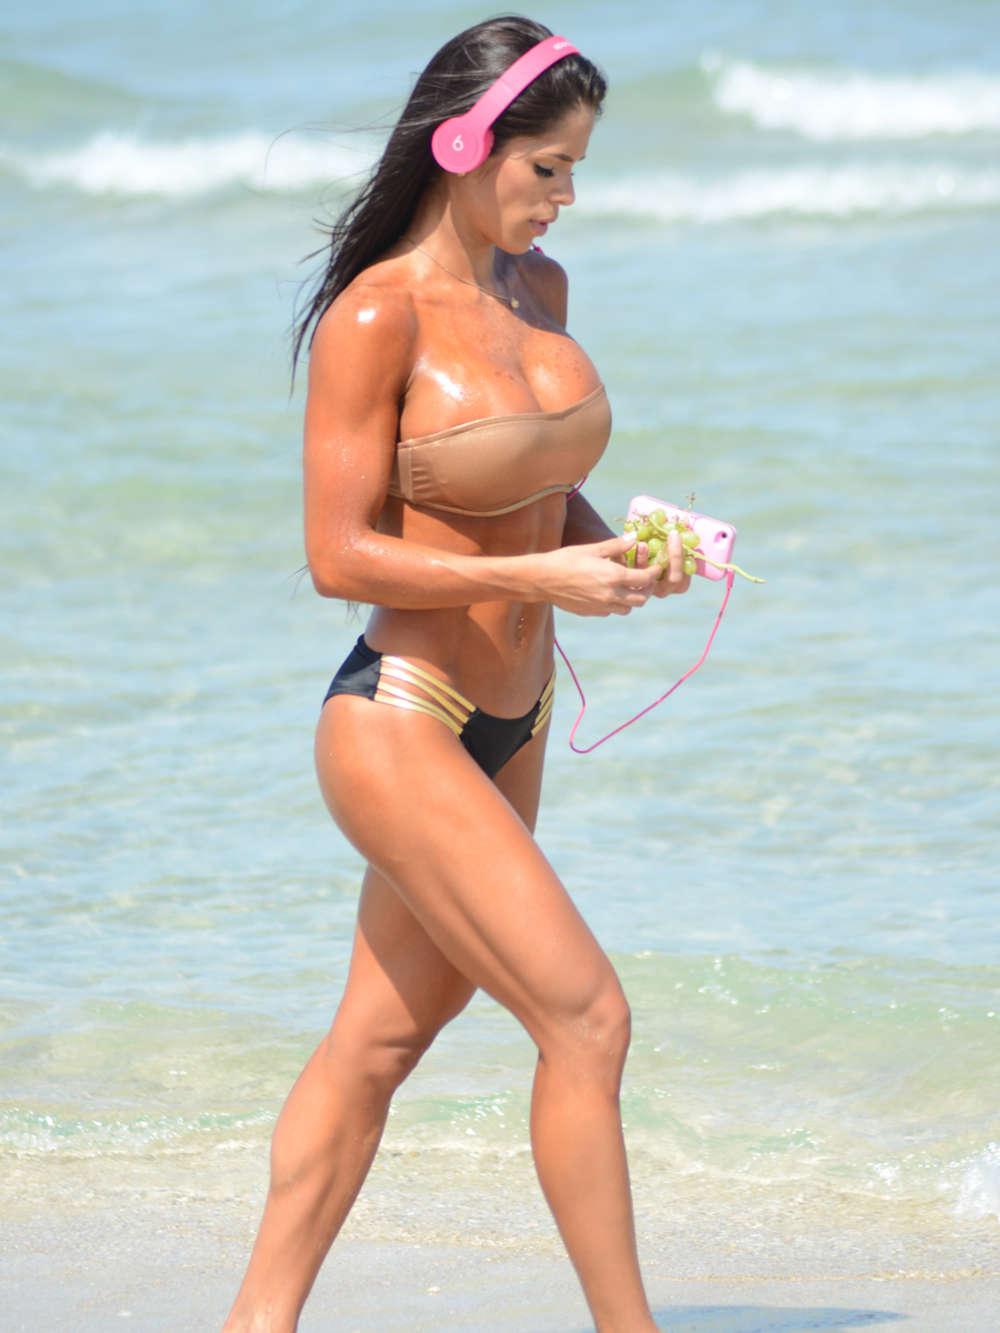 Michelle Lewin Hot Bikini Photos -02 | GotCeleb